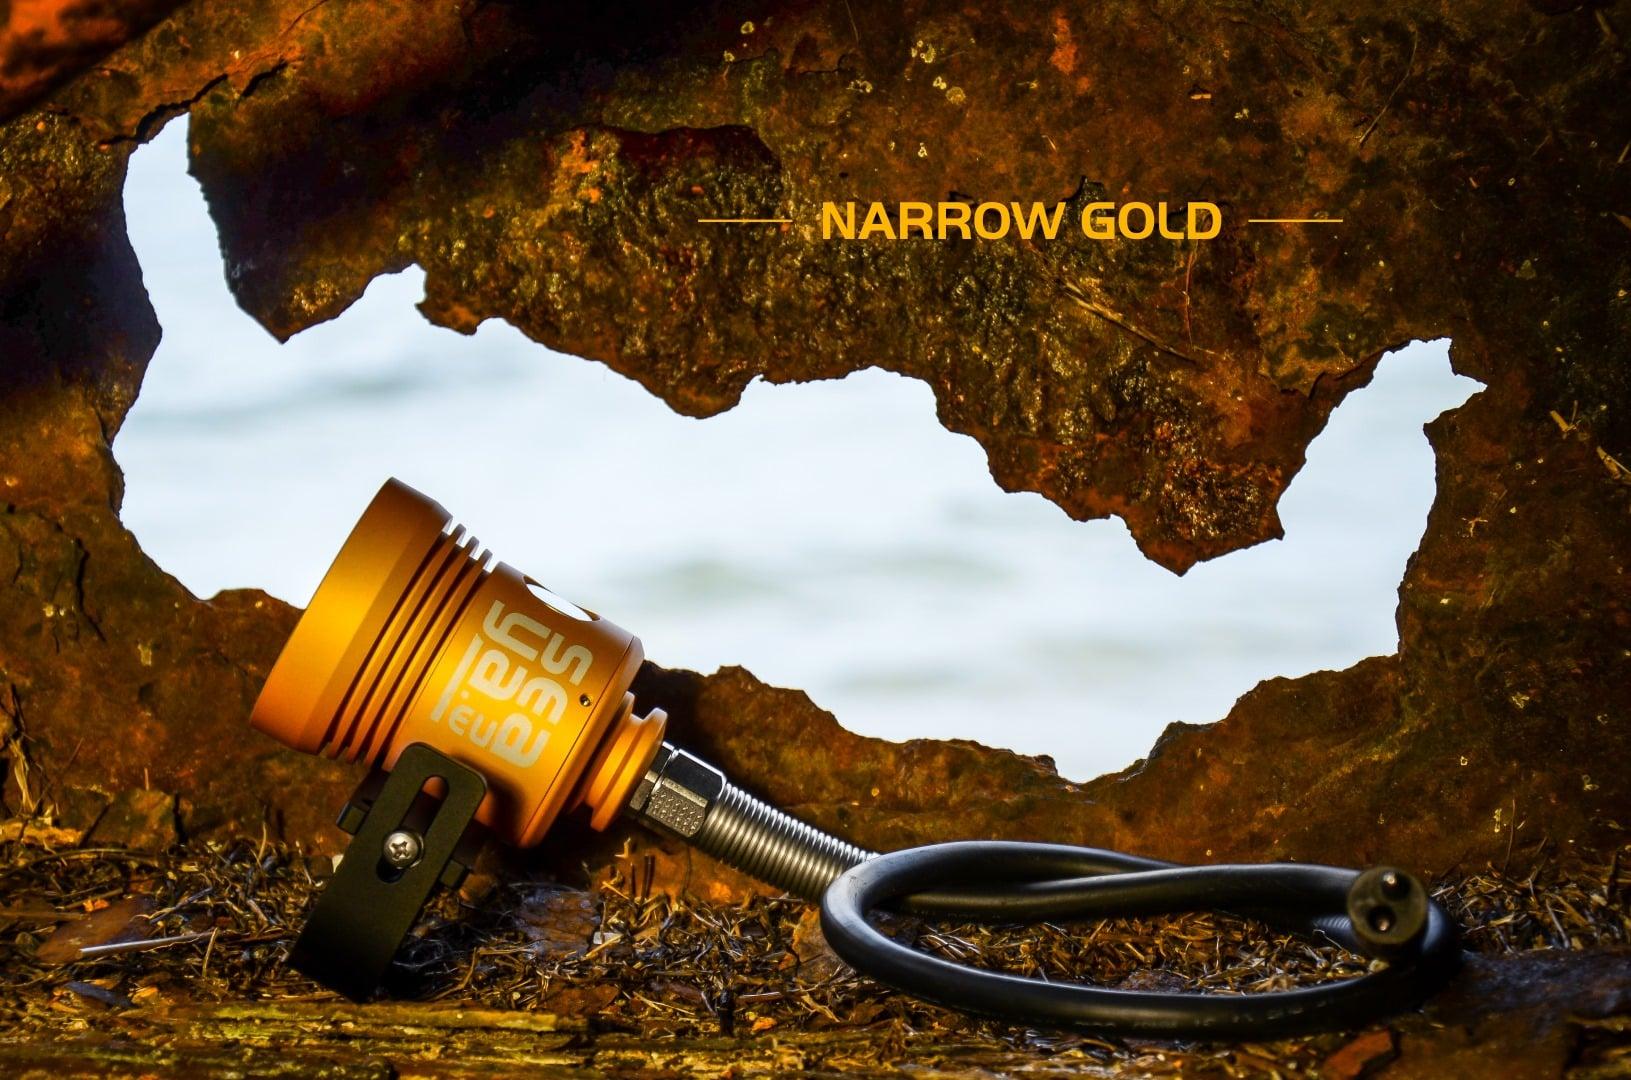 złota latarka SeaYa Narrow